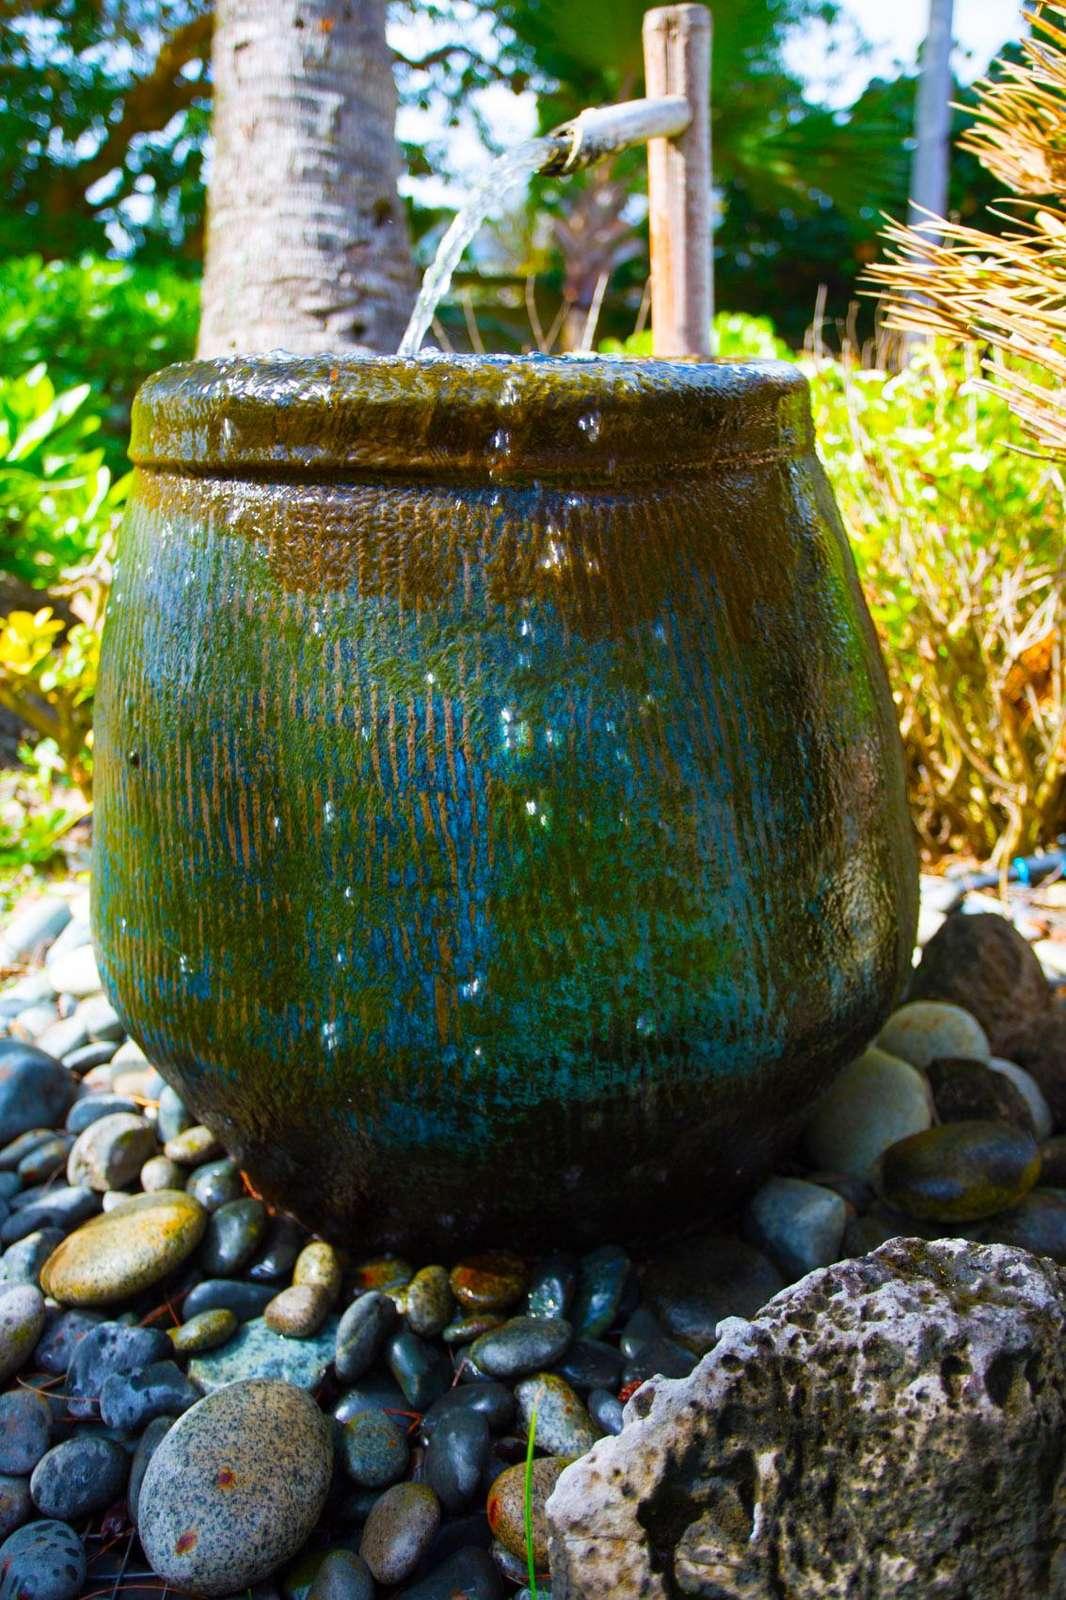 Garden water vase by COCO BUNGALOW